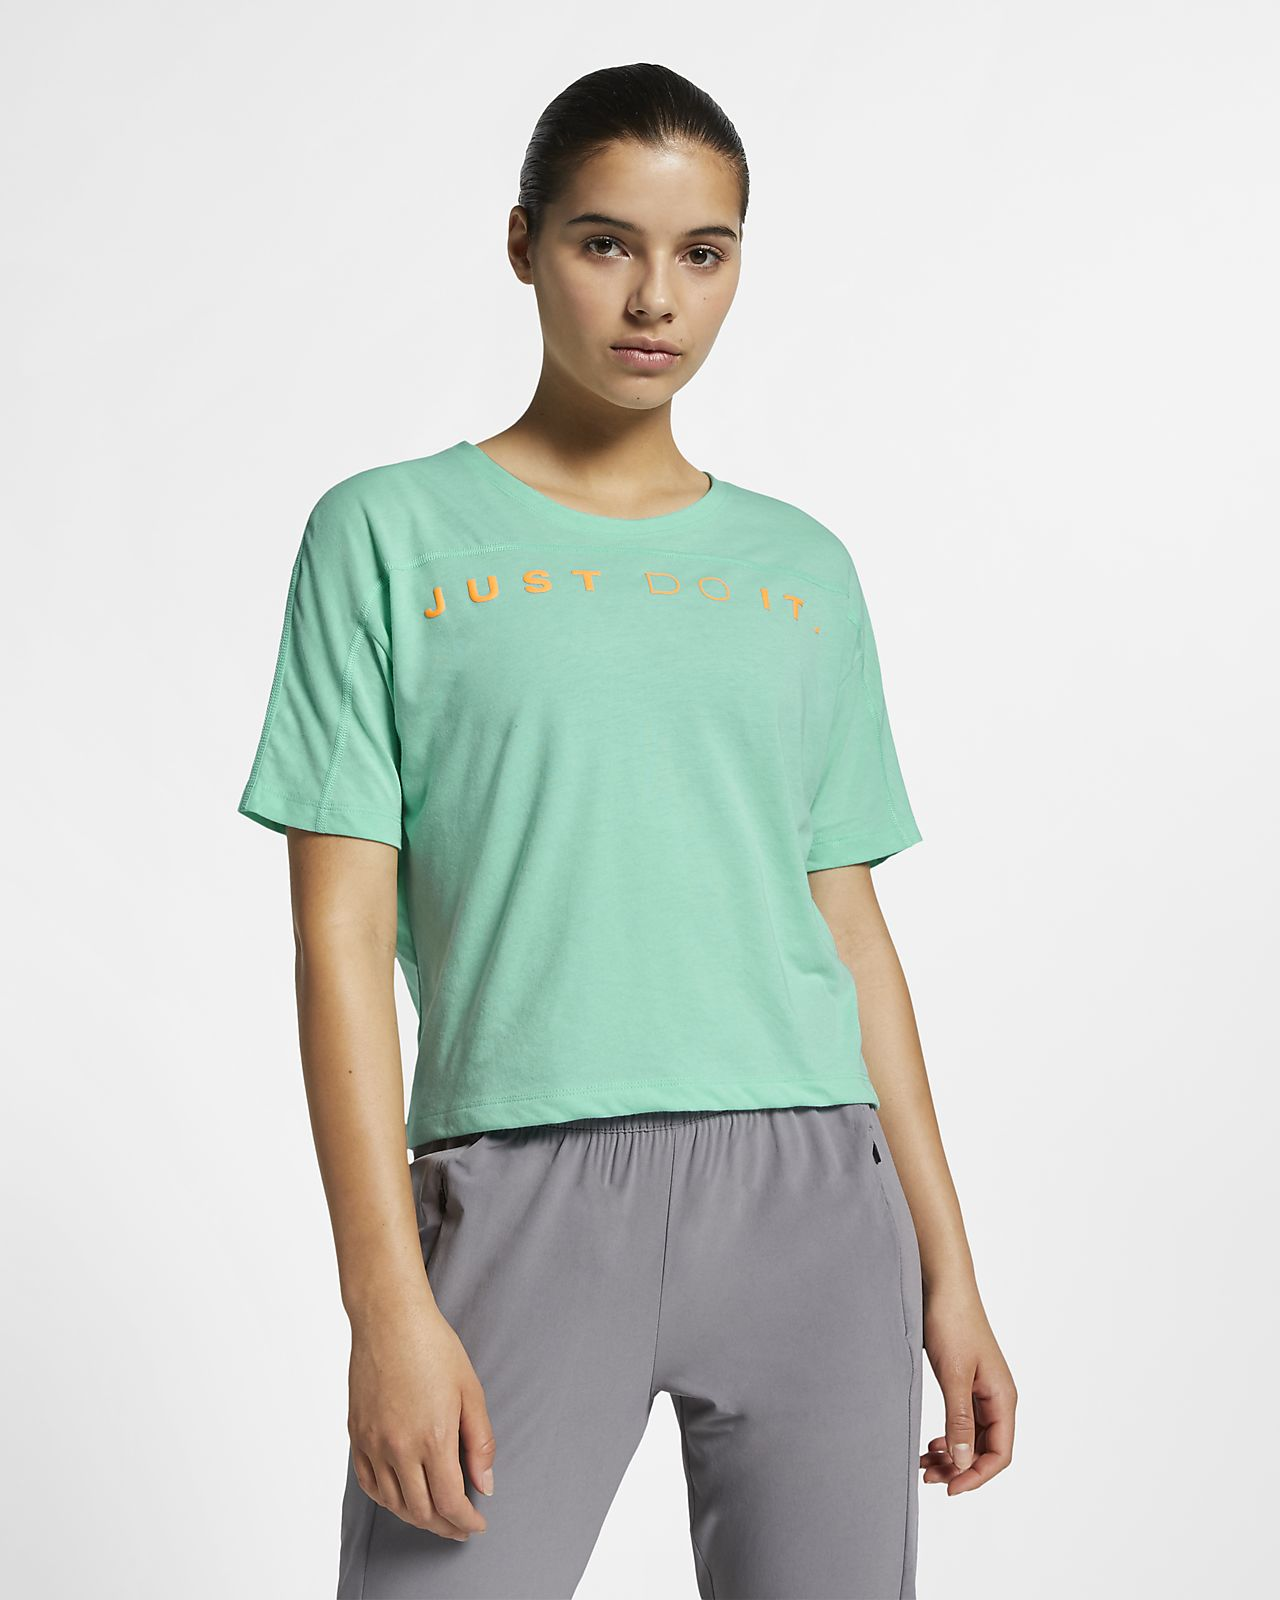 9e4f0141c185 Γυναικεία κοντομάνικη μπλούζα για τρέξιμο Nike Dri-FIT Miler. Nike ...